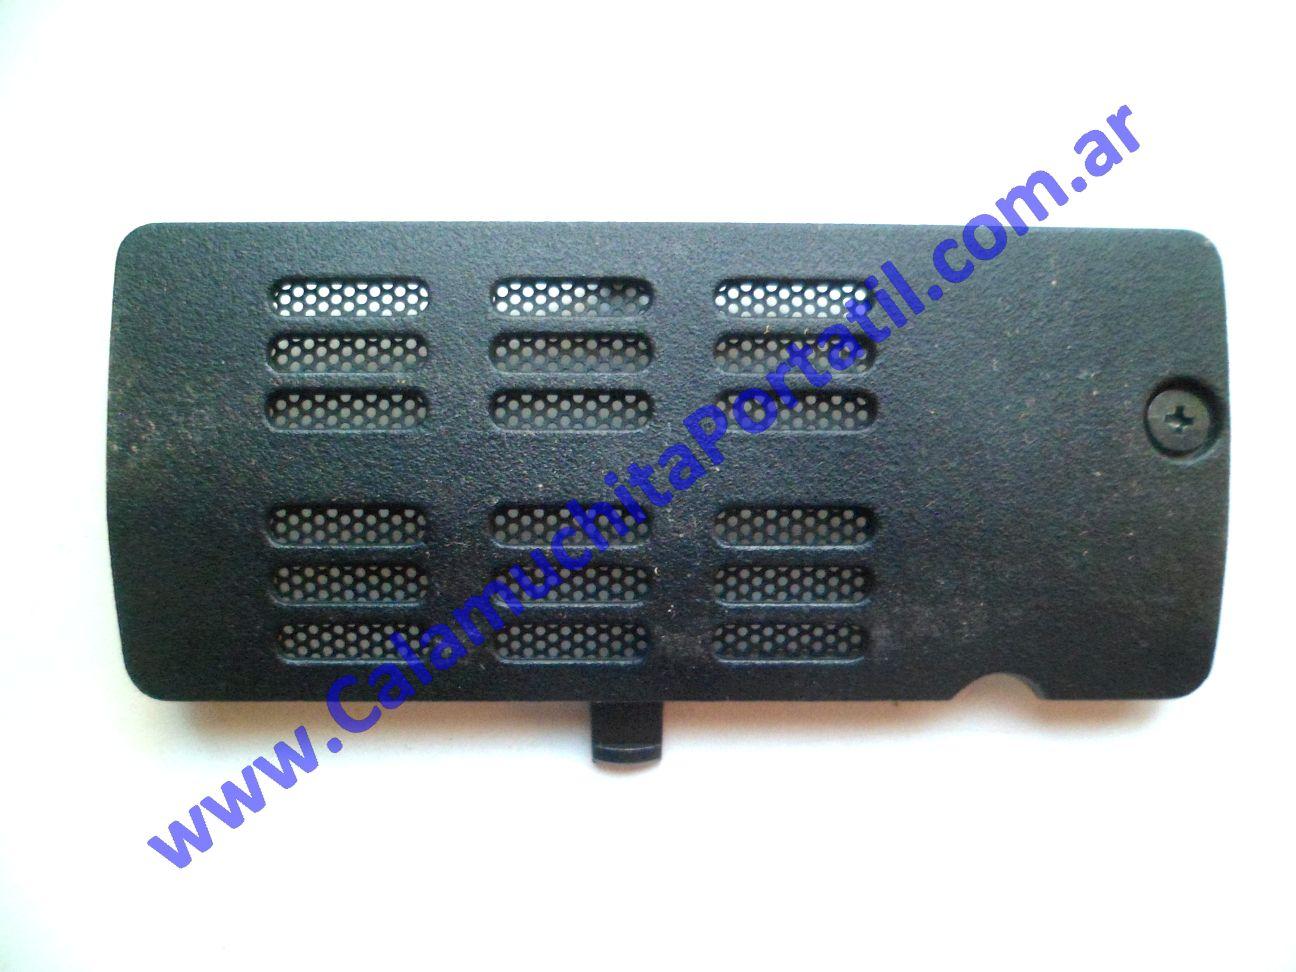 0588CTW Carcasas Tapa Wifi Acer Aspire 4540-1844 / KBLG0